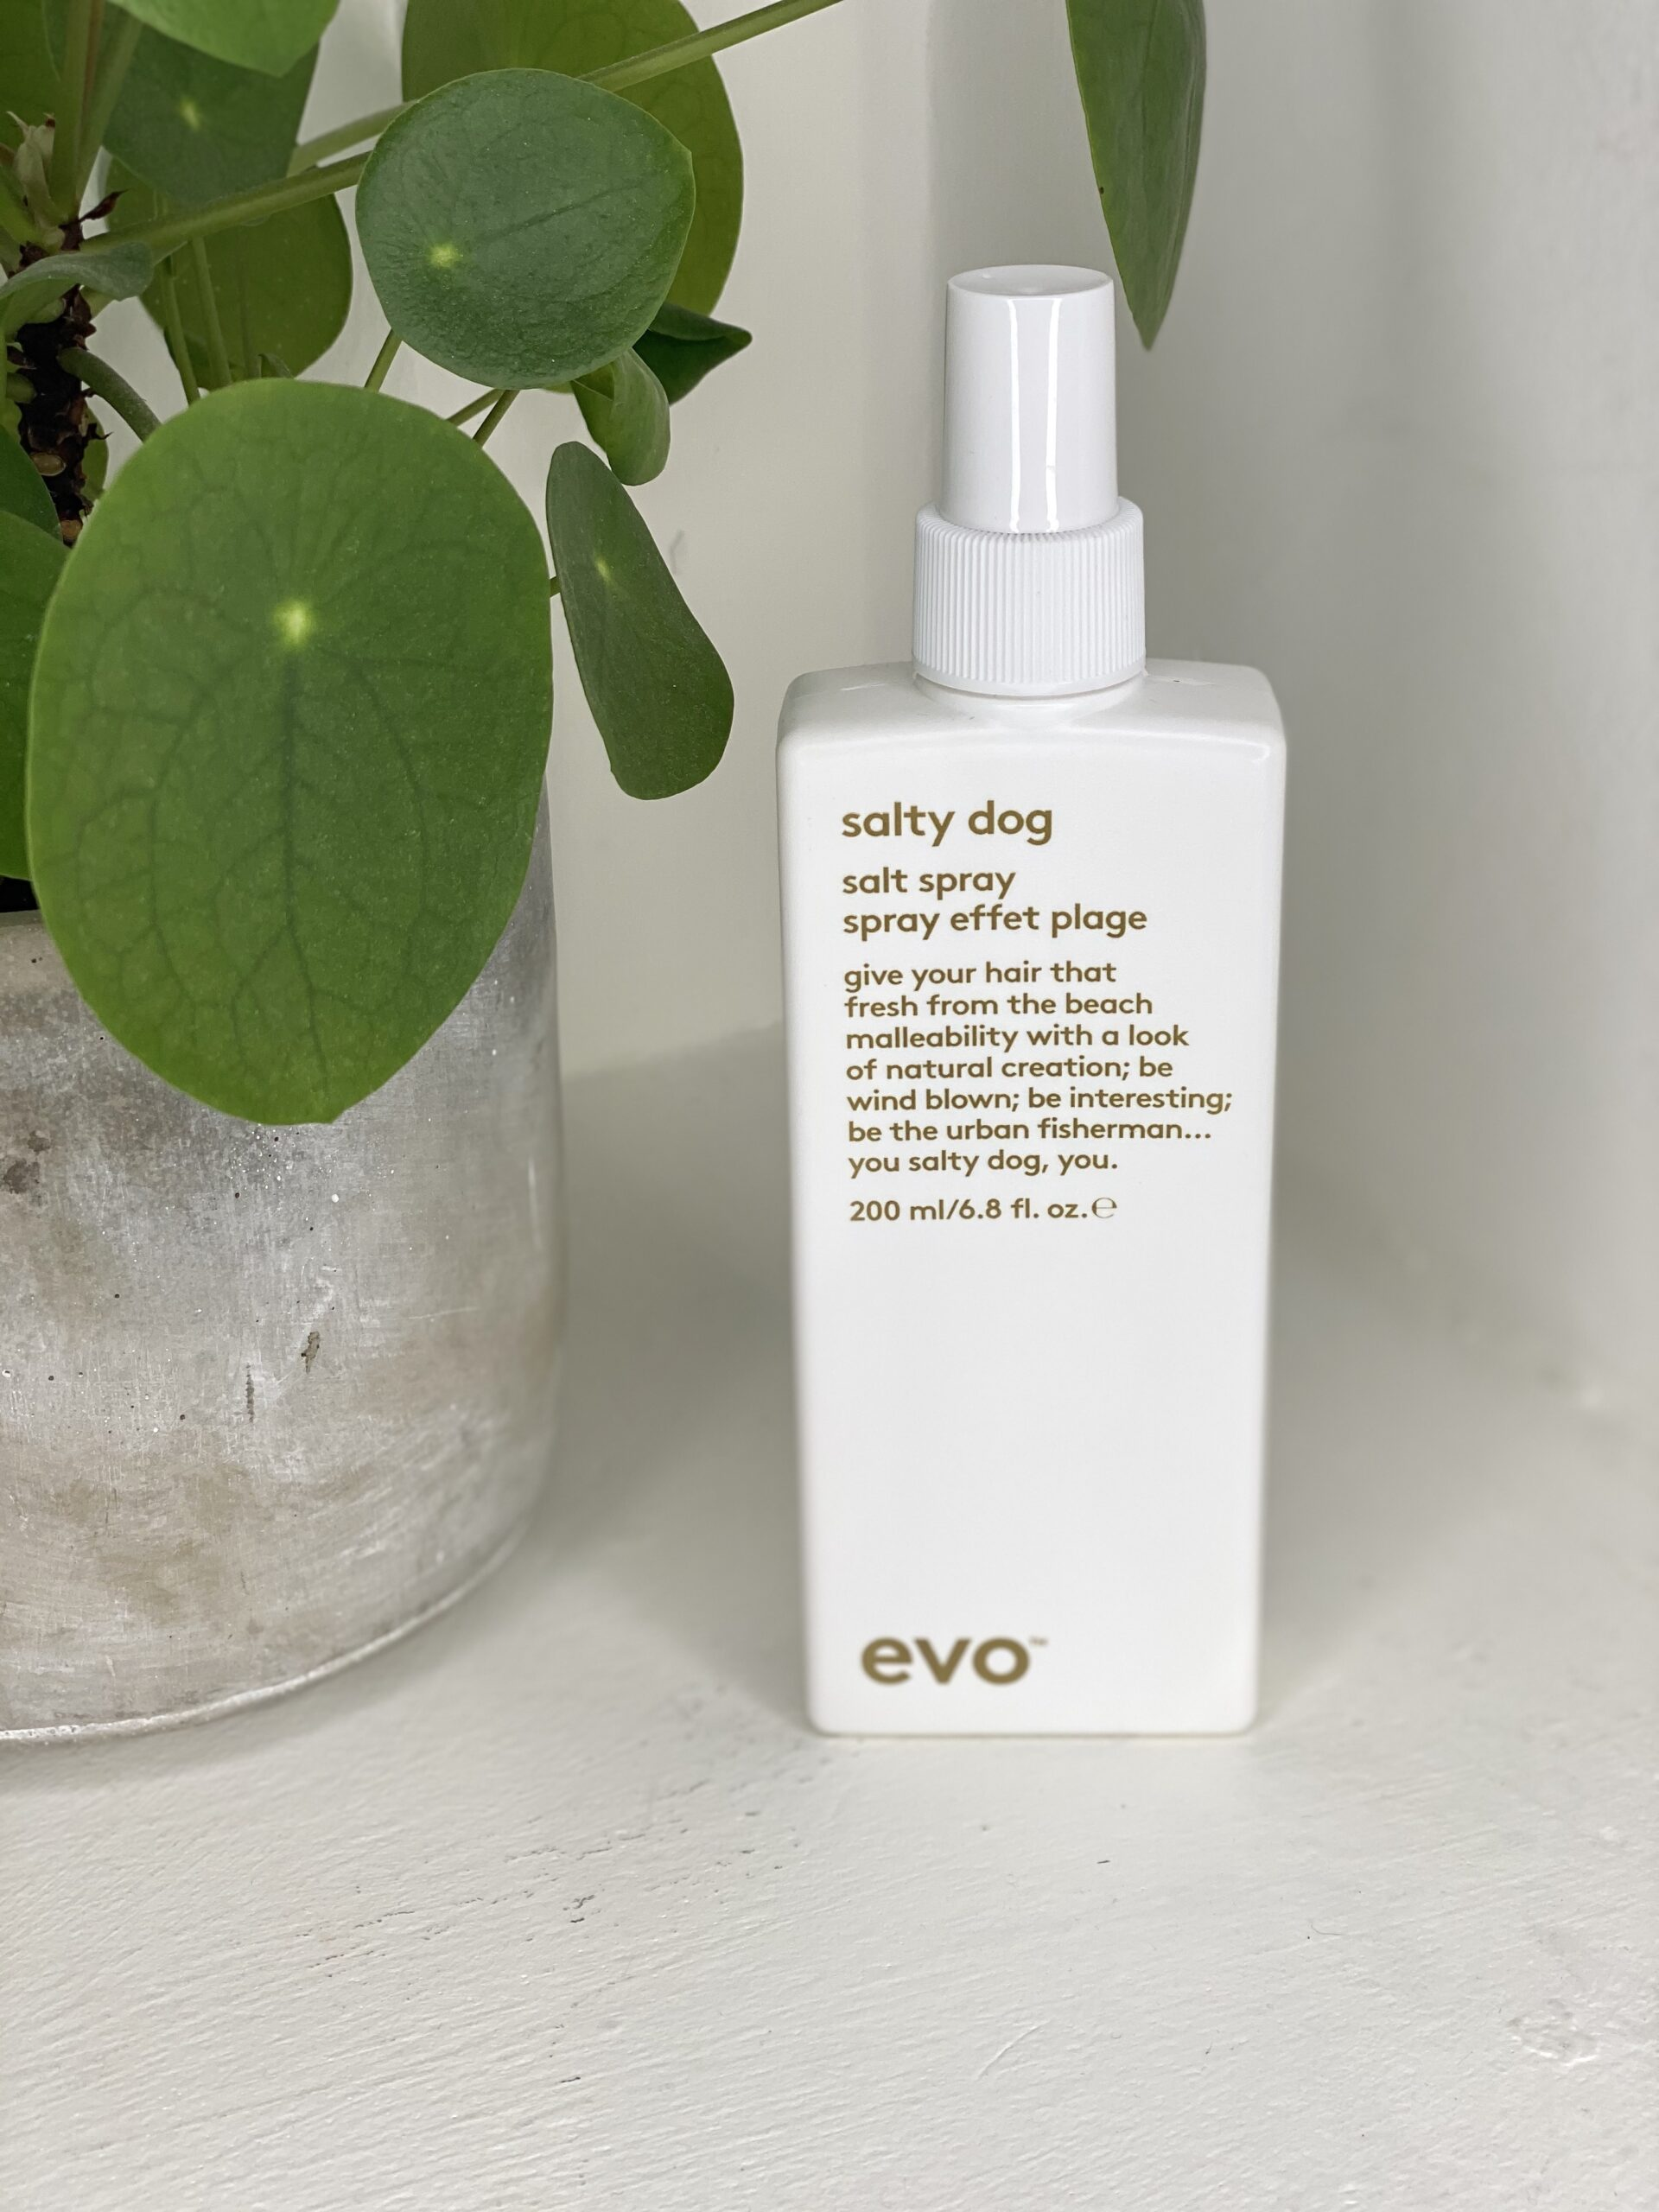 EVO Salty Dog